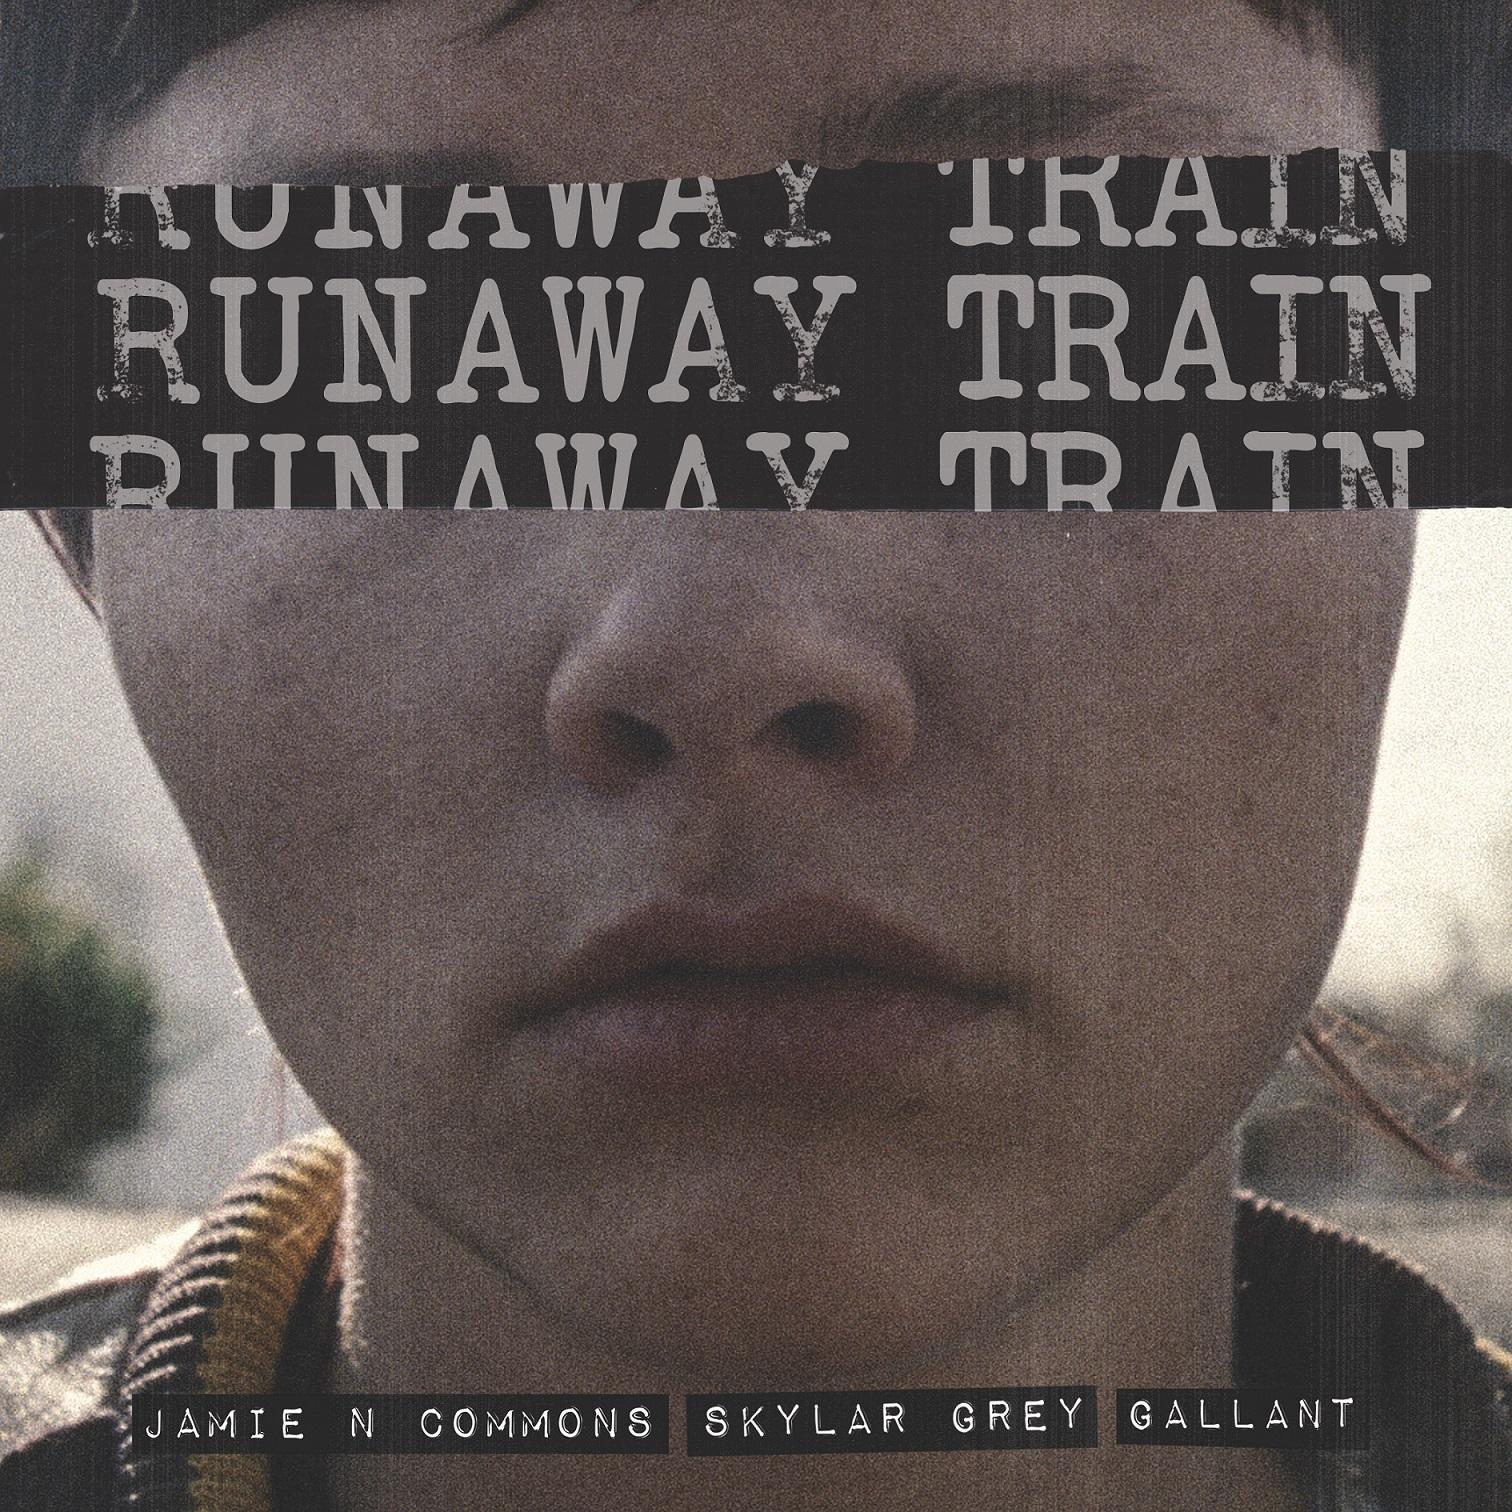 Billie Eilish - Bury A Friend cover